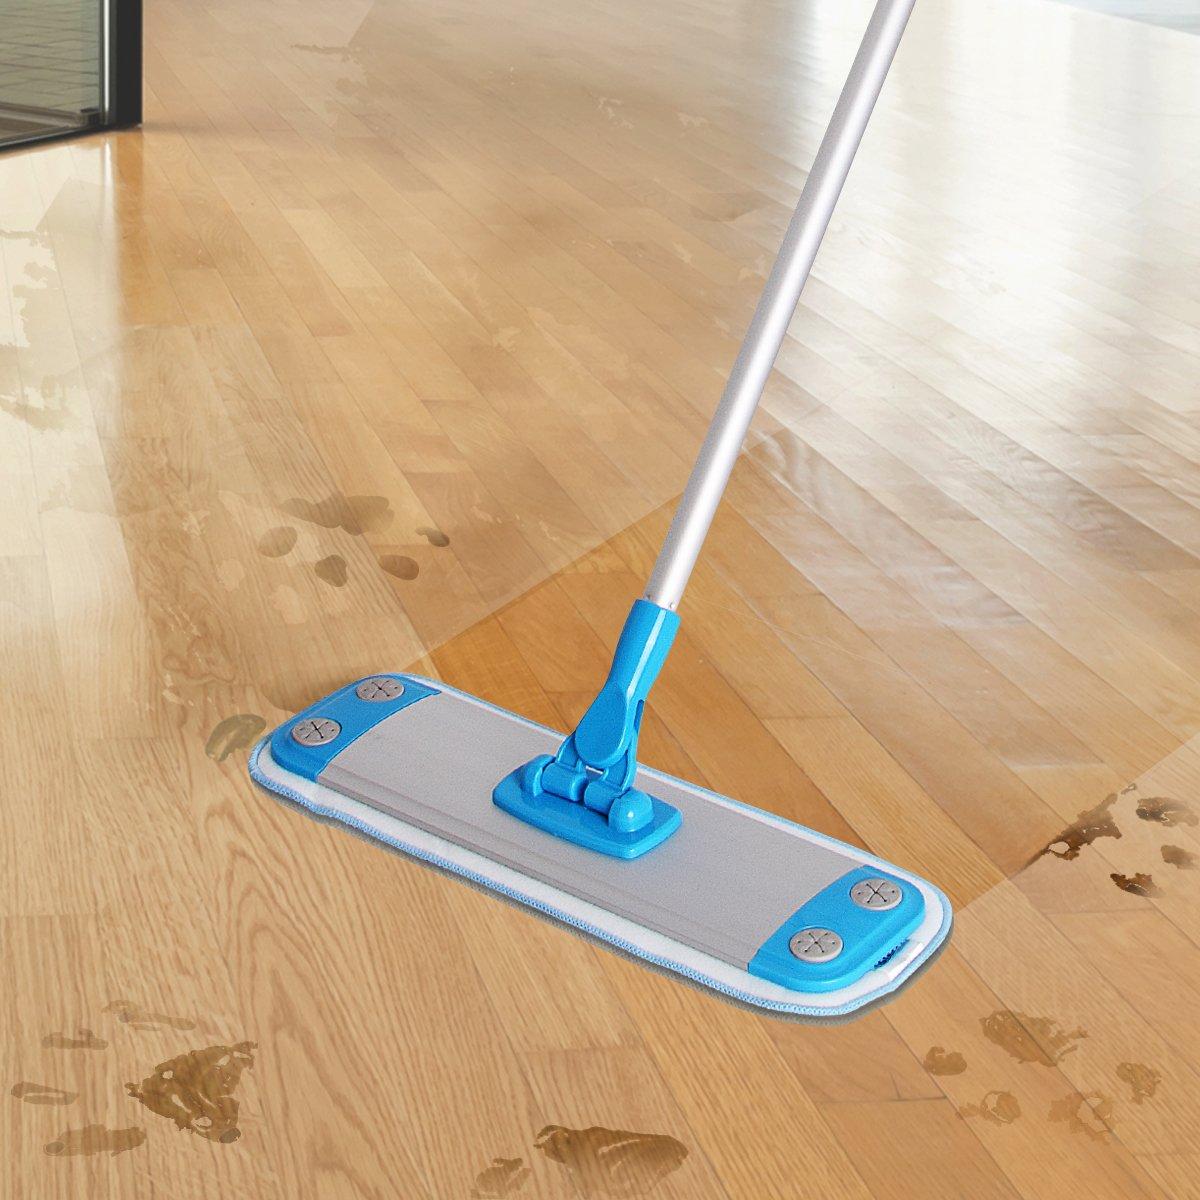 Dust mop for wood floors - Siga Aluminum Microfiber Floor Mop Size 40 X 12cm 1 Free Microfiber Refill Included Aluminum Mop Frame With Aluminum Telescopic Pole Home Kitchen